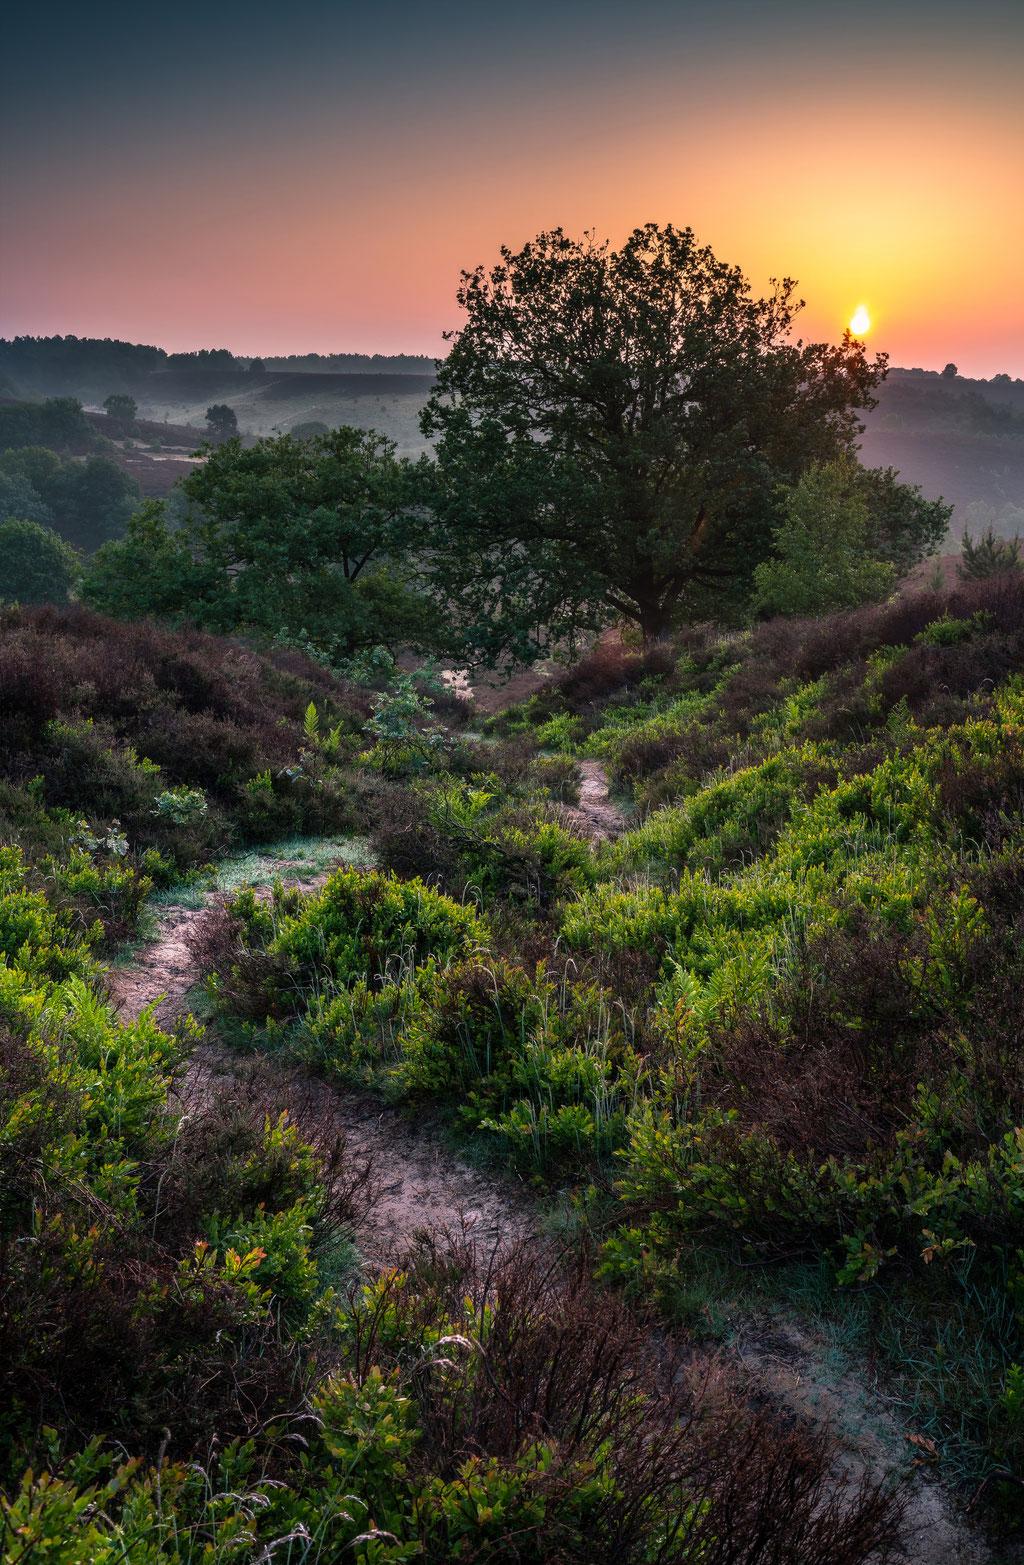 Dutch national park Veluwezoom, Martijn van Steenbergen, © 2018